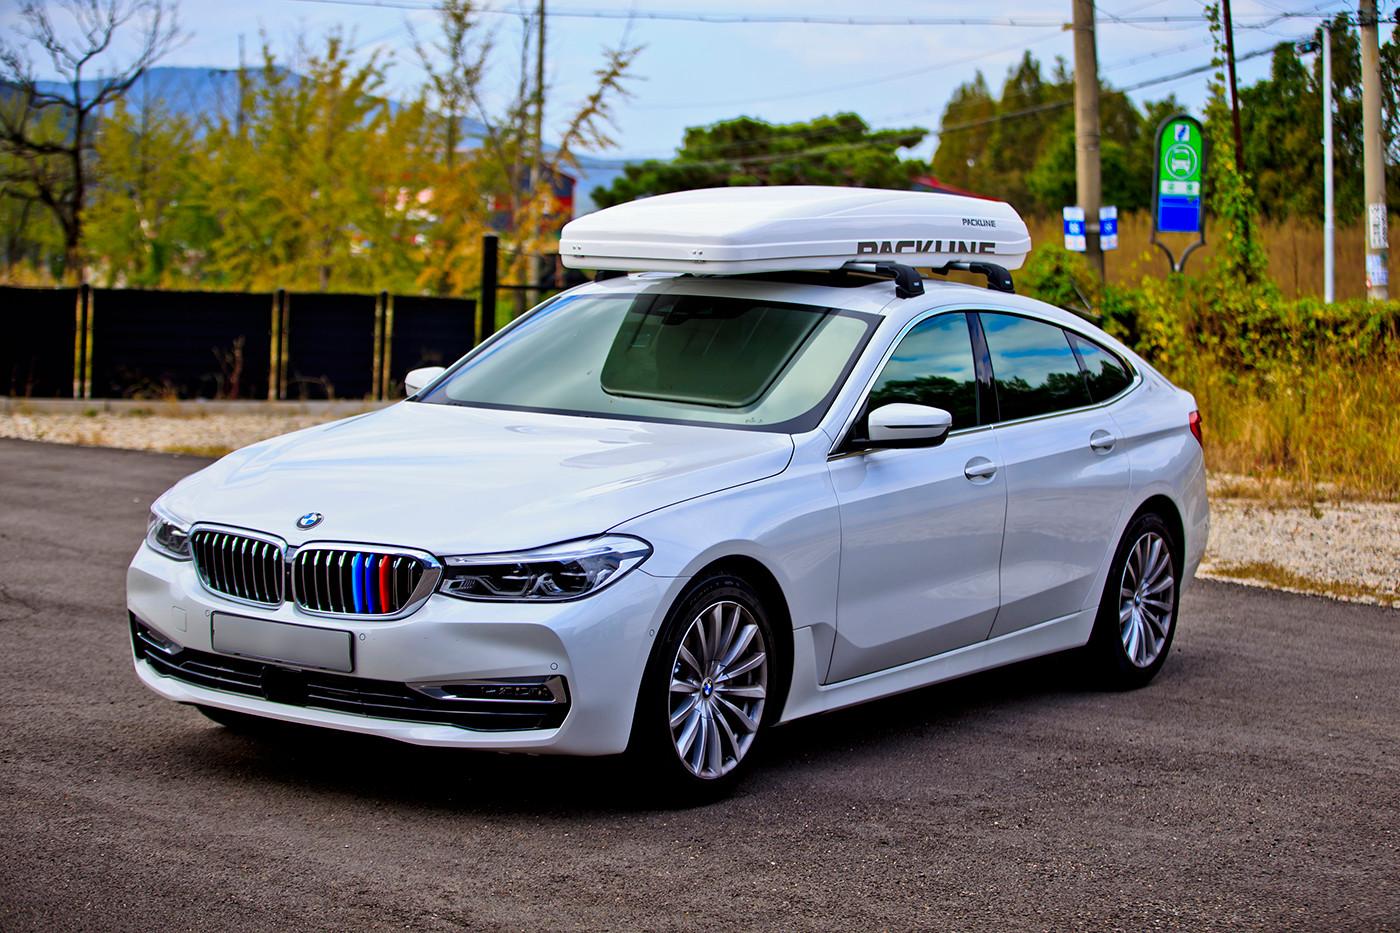 BMW520d 루프박스 fx-s 툴레윙바3.jpg